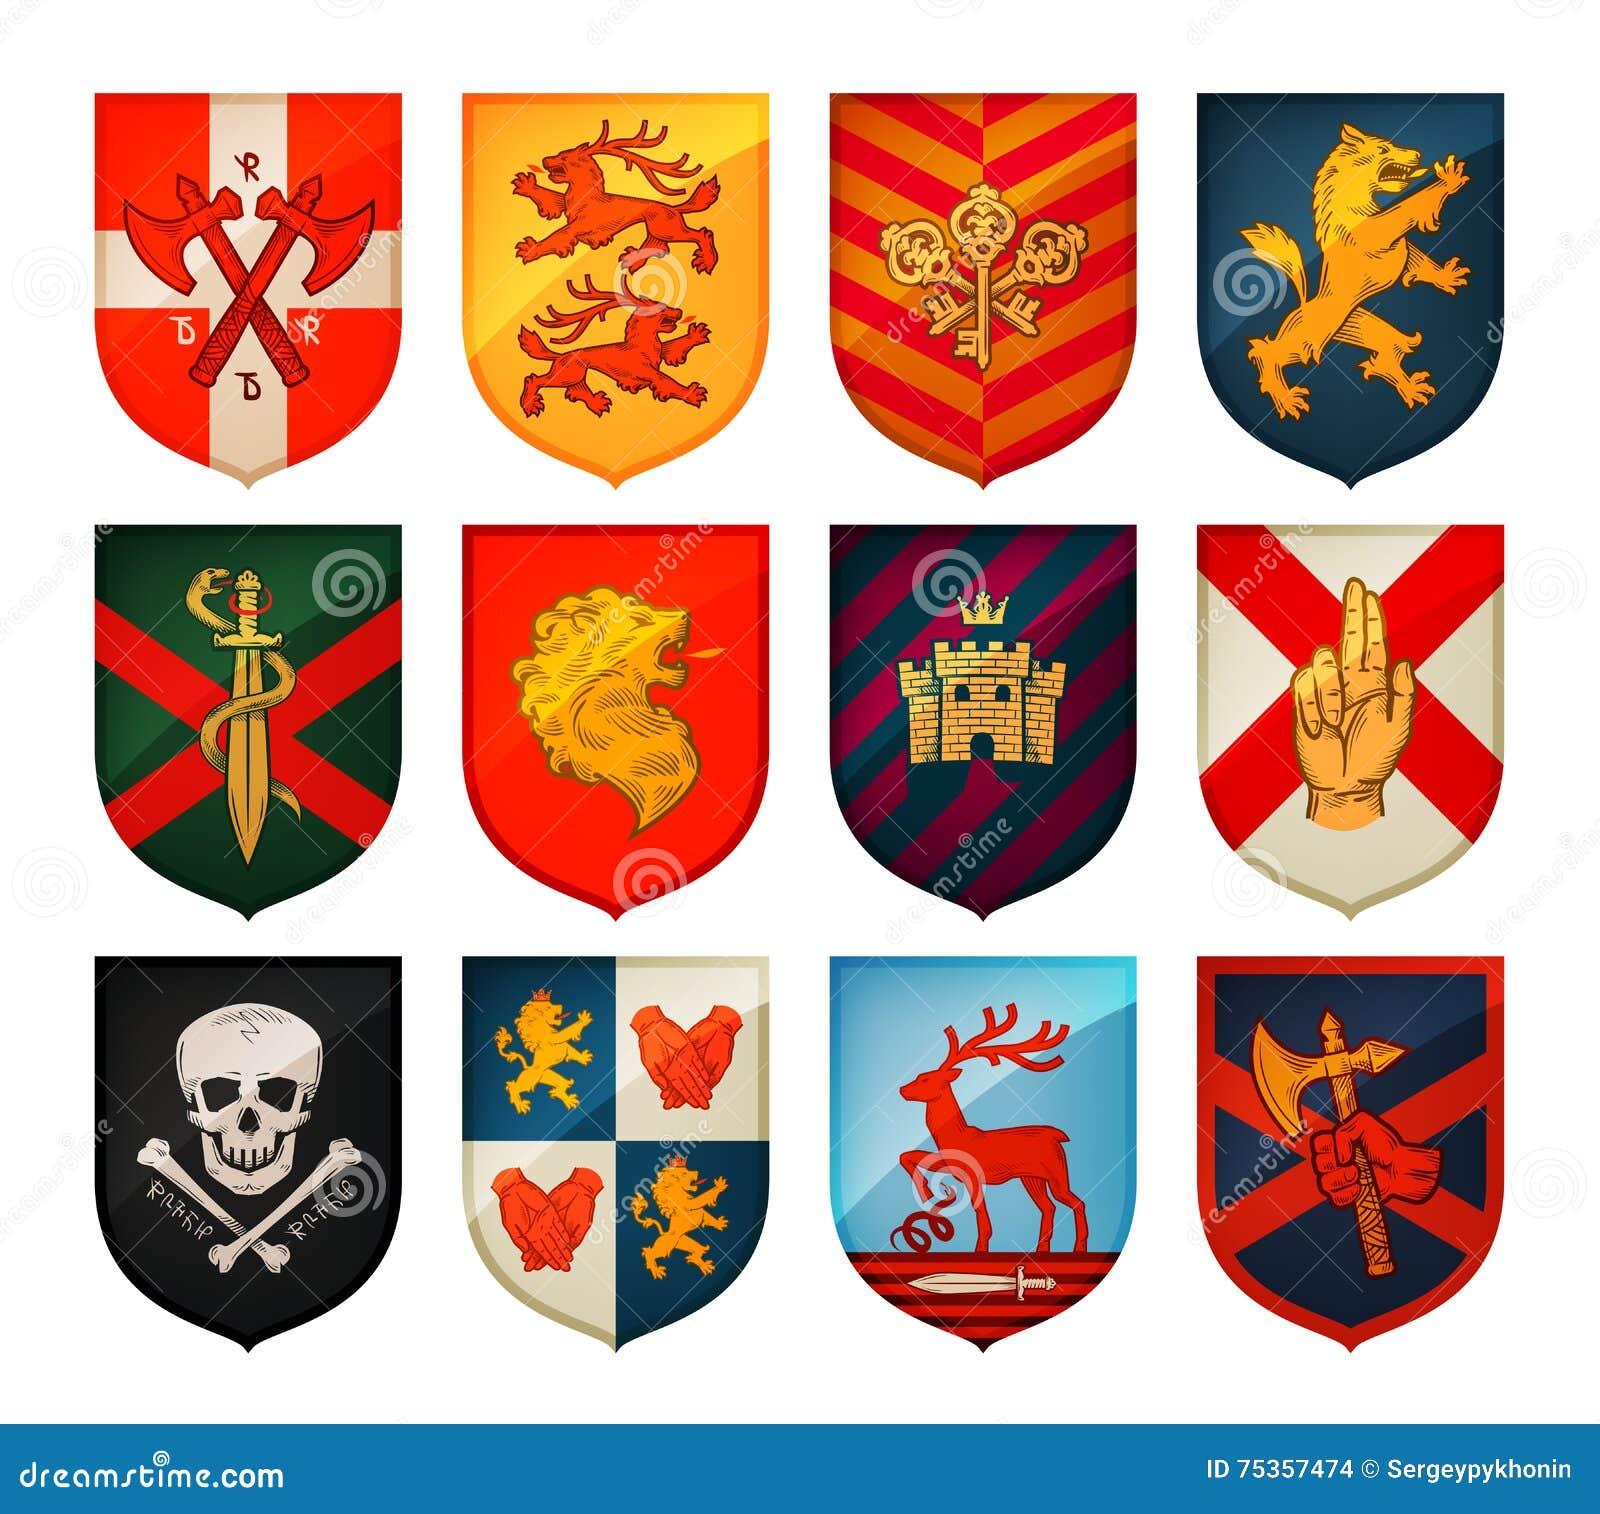 medieval shields symbols and meaning wwwimgkidcom